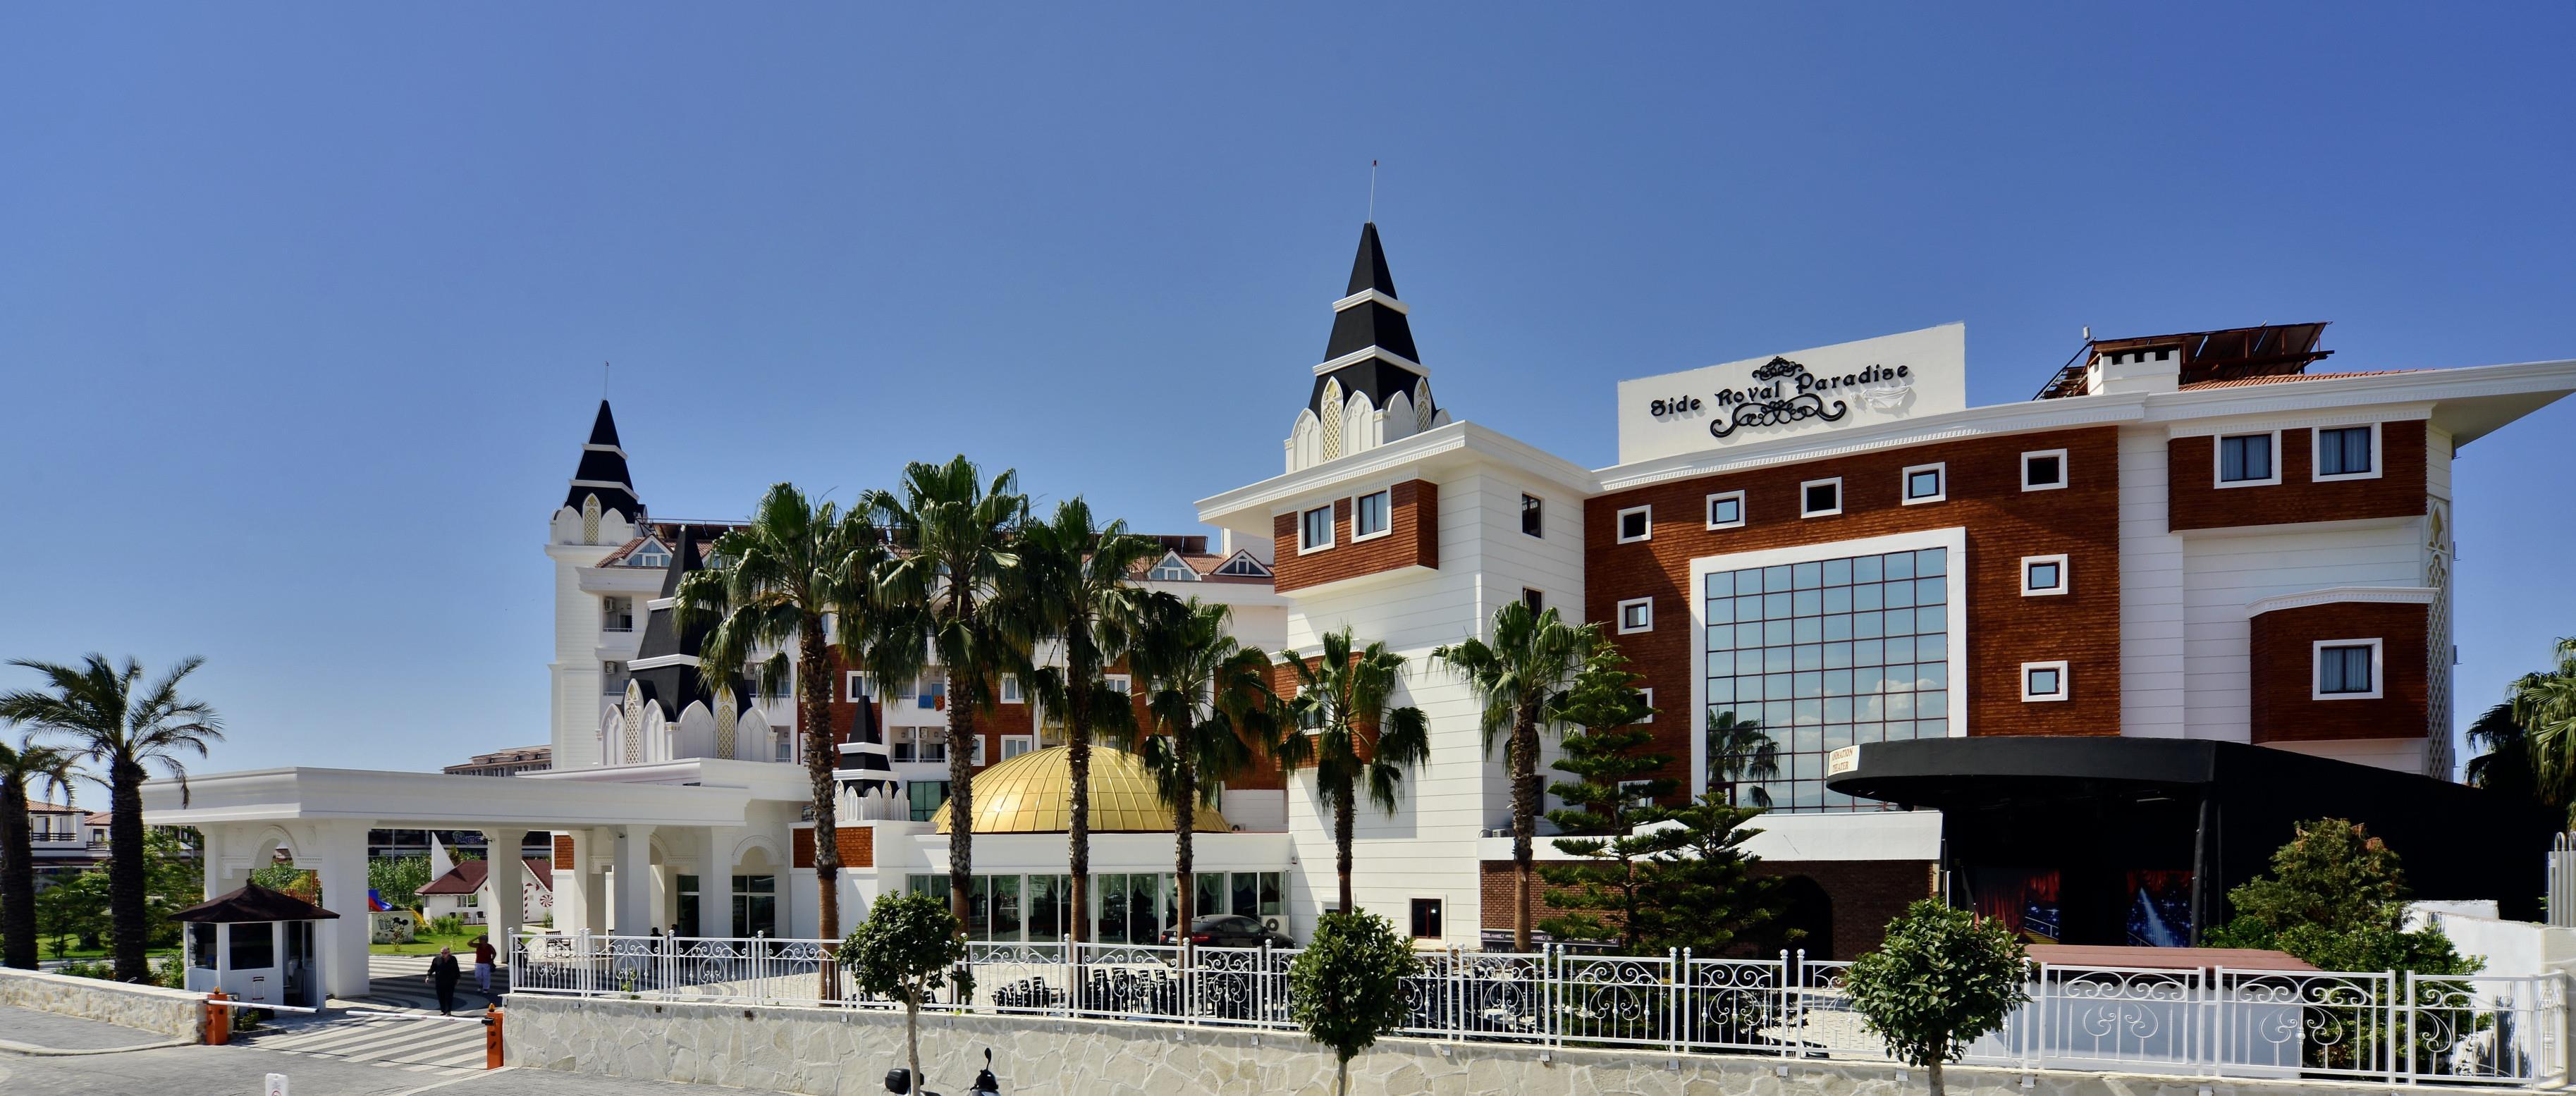 http://www.orextravel.sk/OREX/hotelphotos/side-royal-paradise-general-0012.jpg